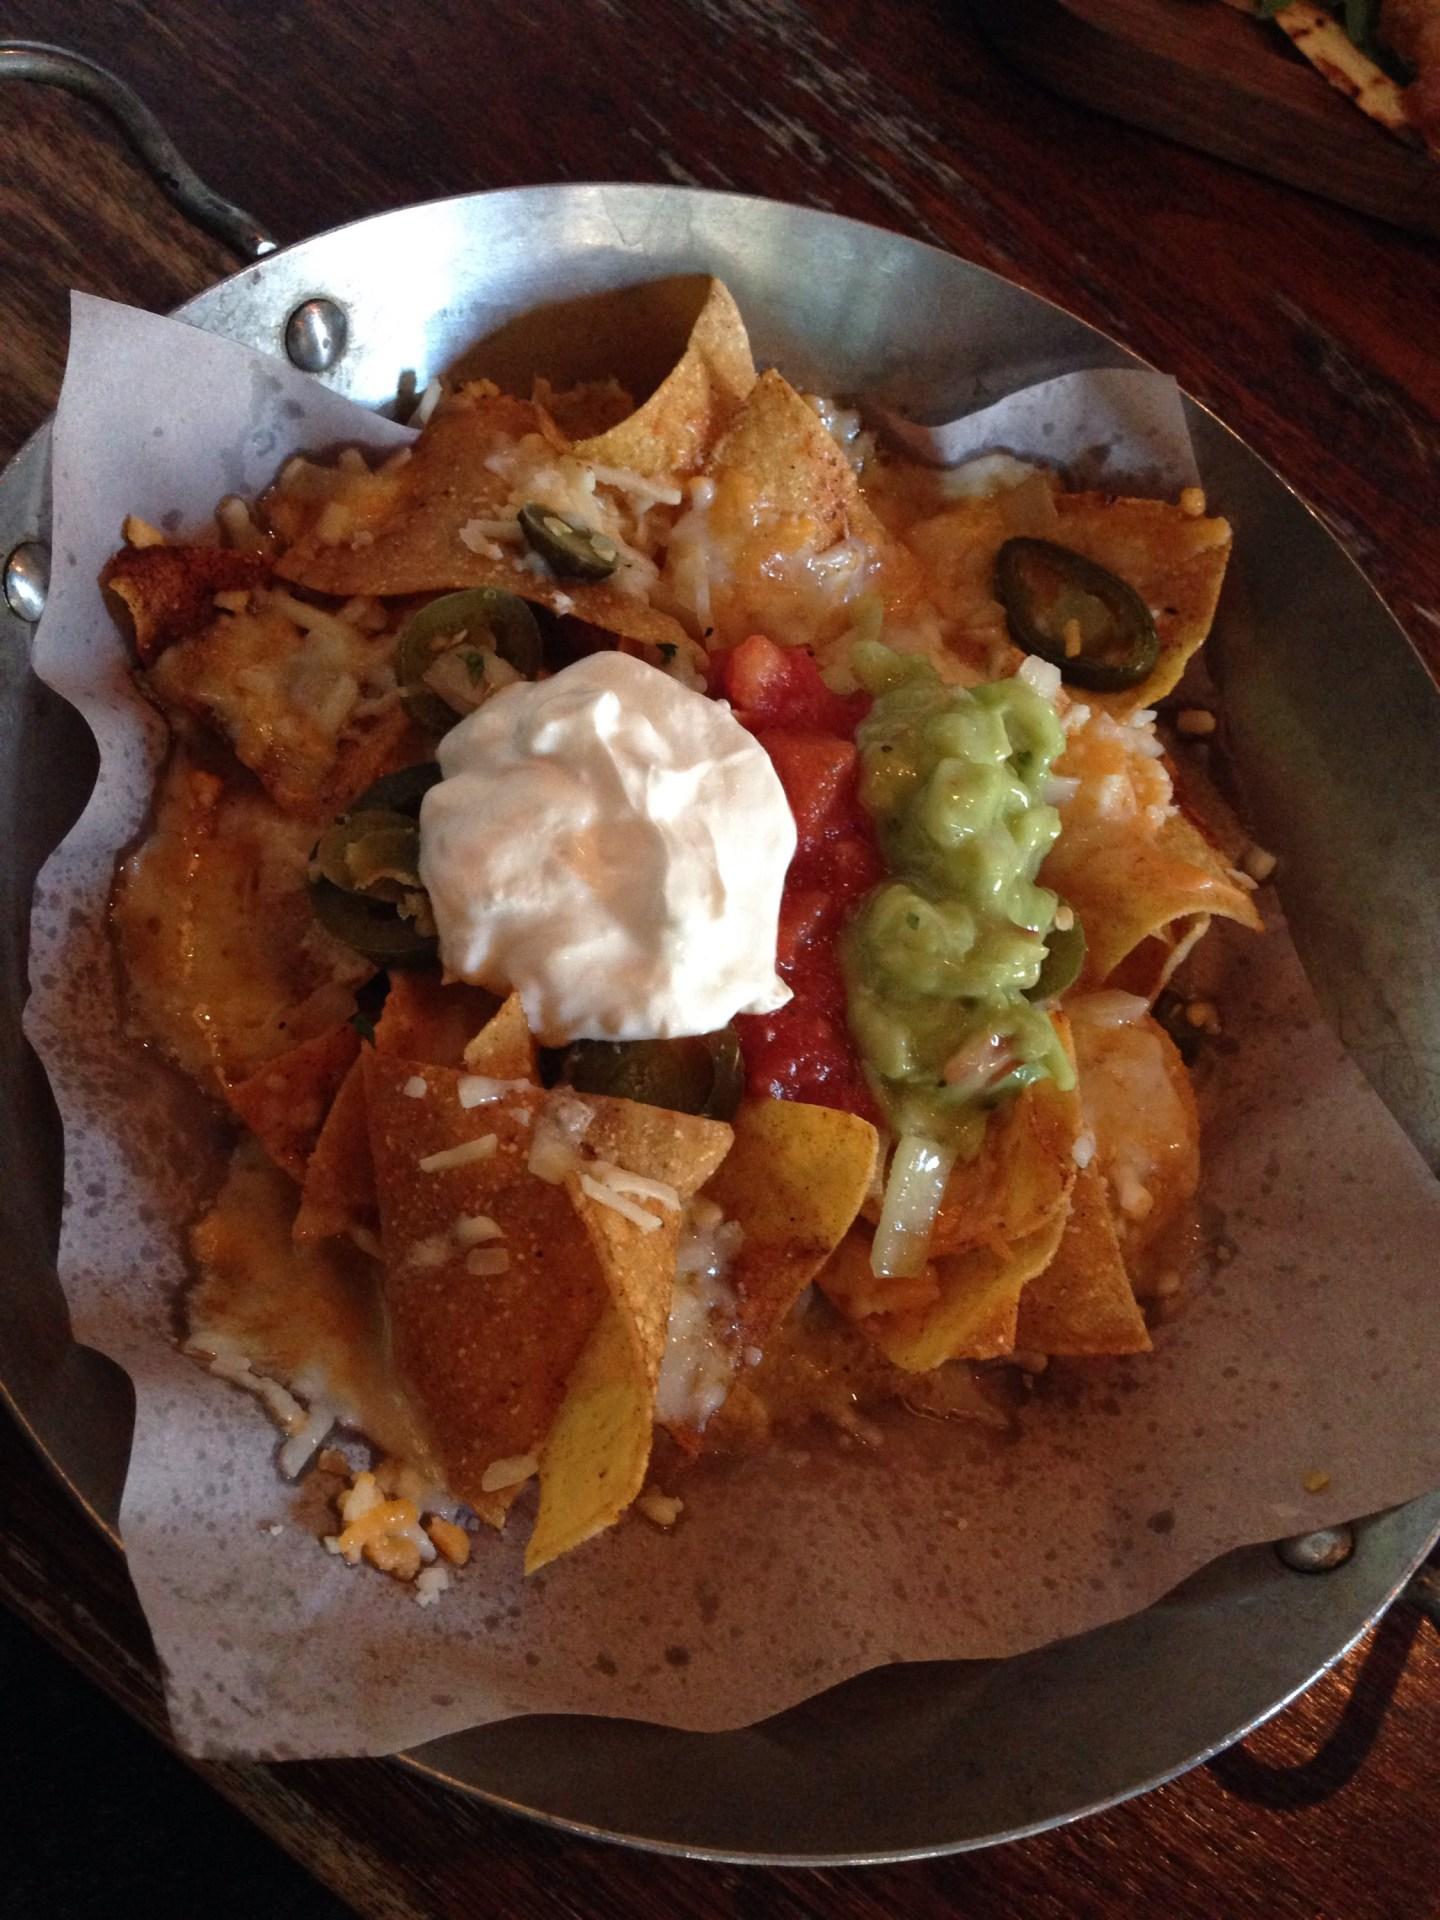 Loaded nachos at Las Iguanas, Mill Lane